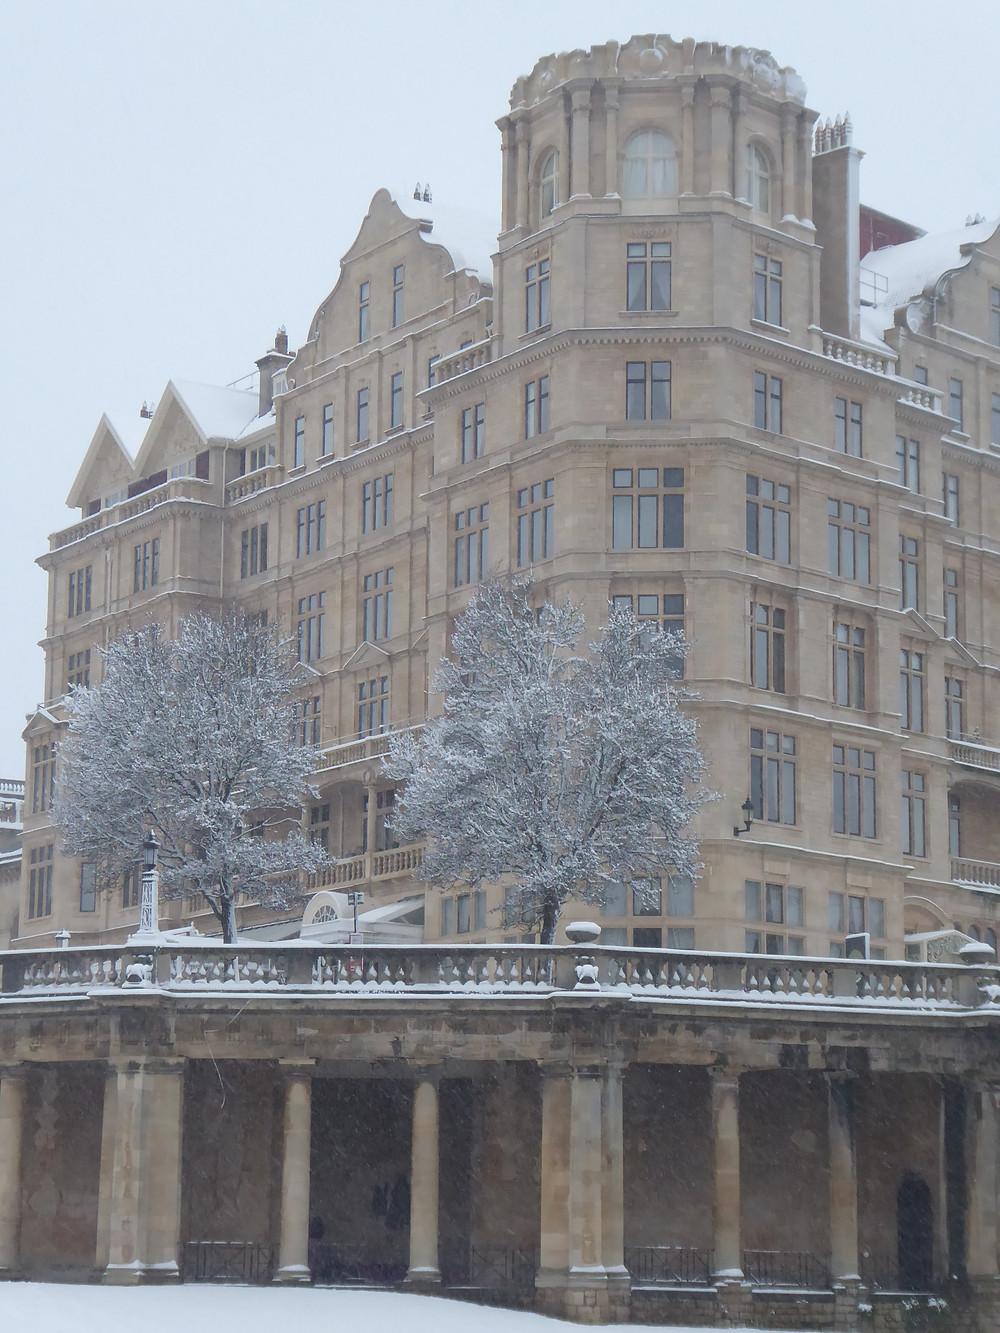 Bath Empire Hotel in winter - Bath Insider Tours